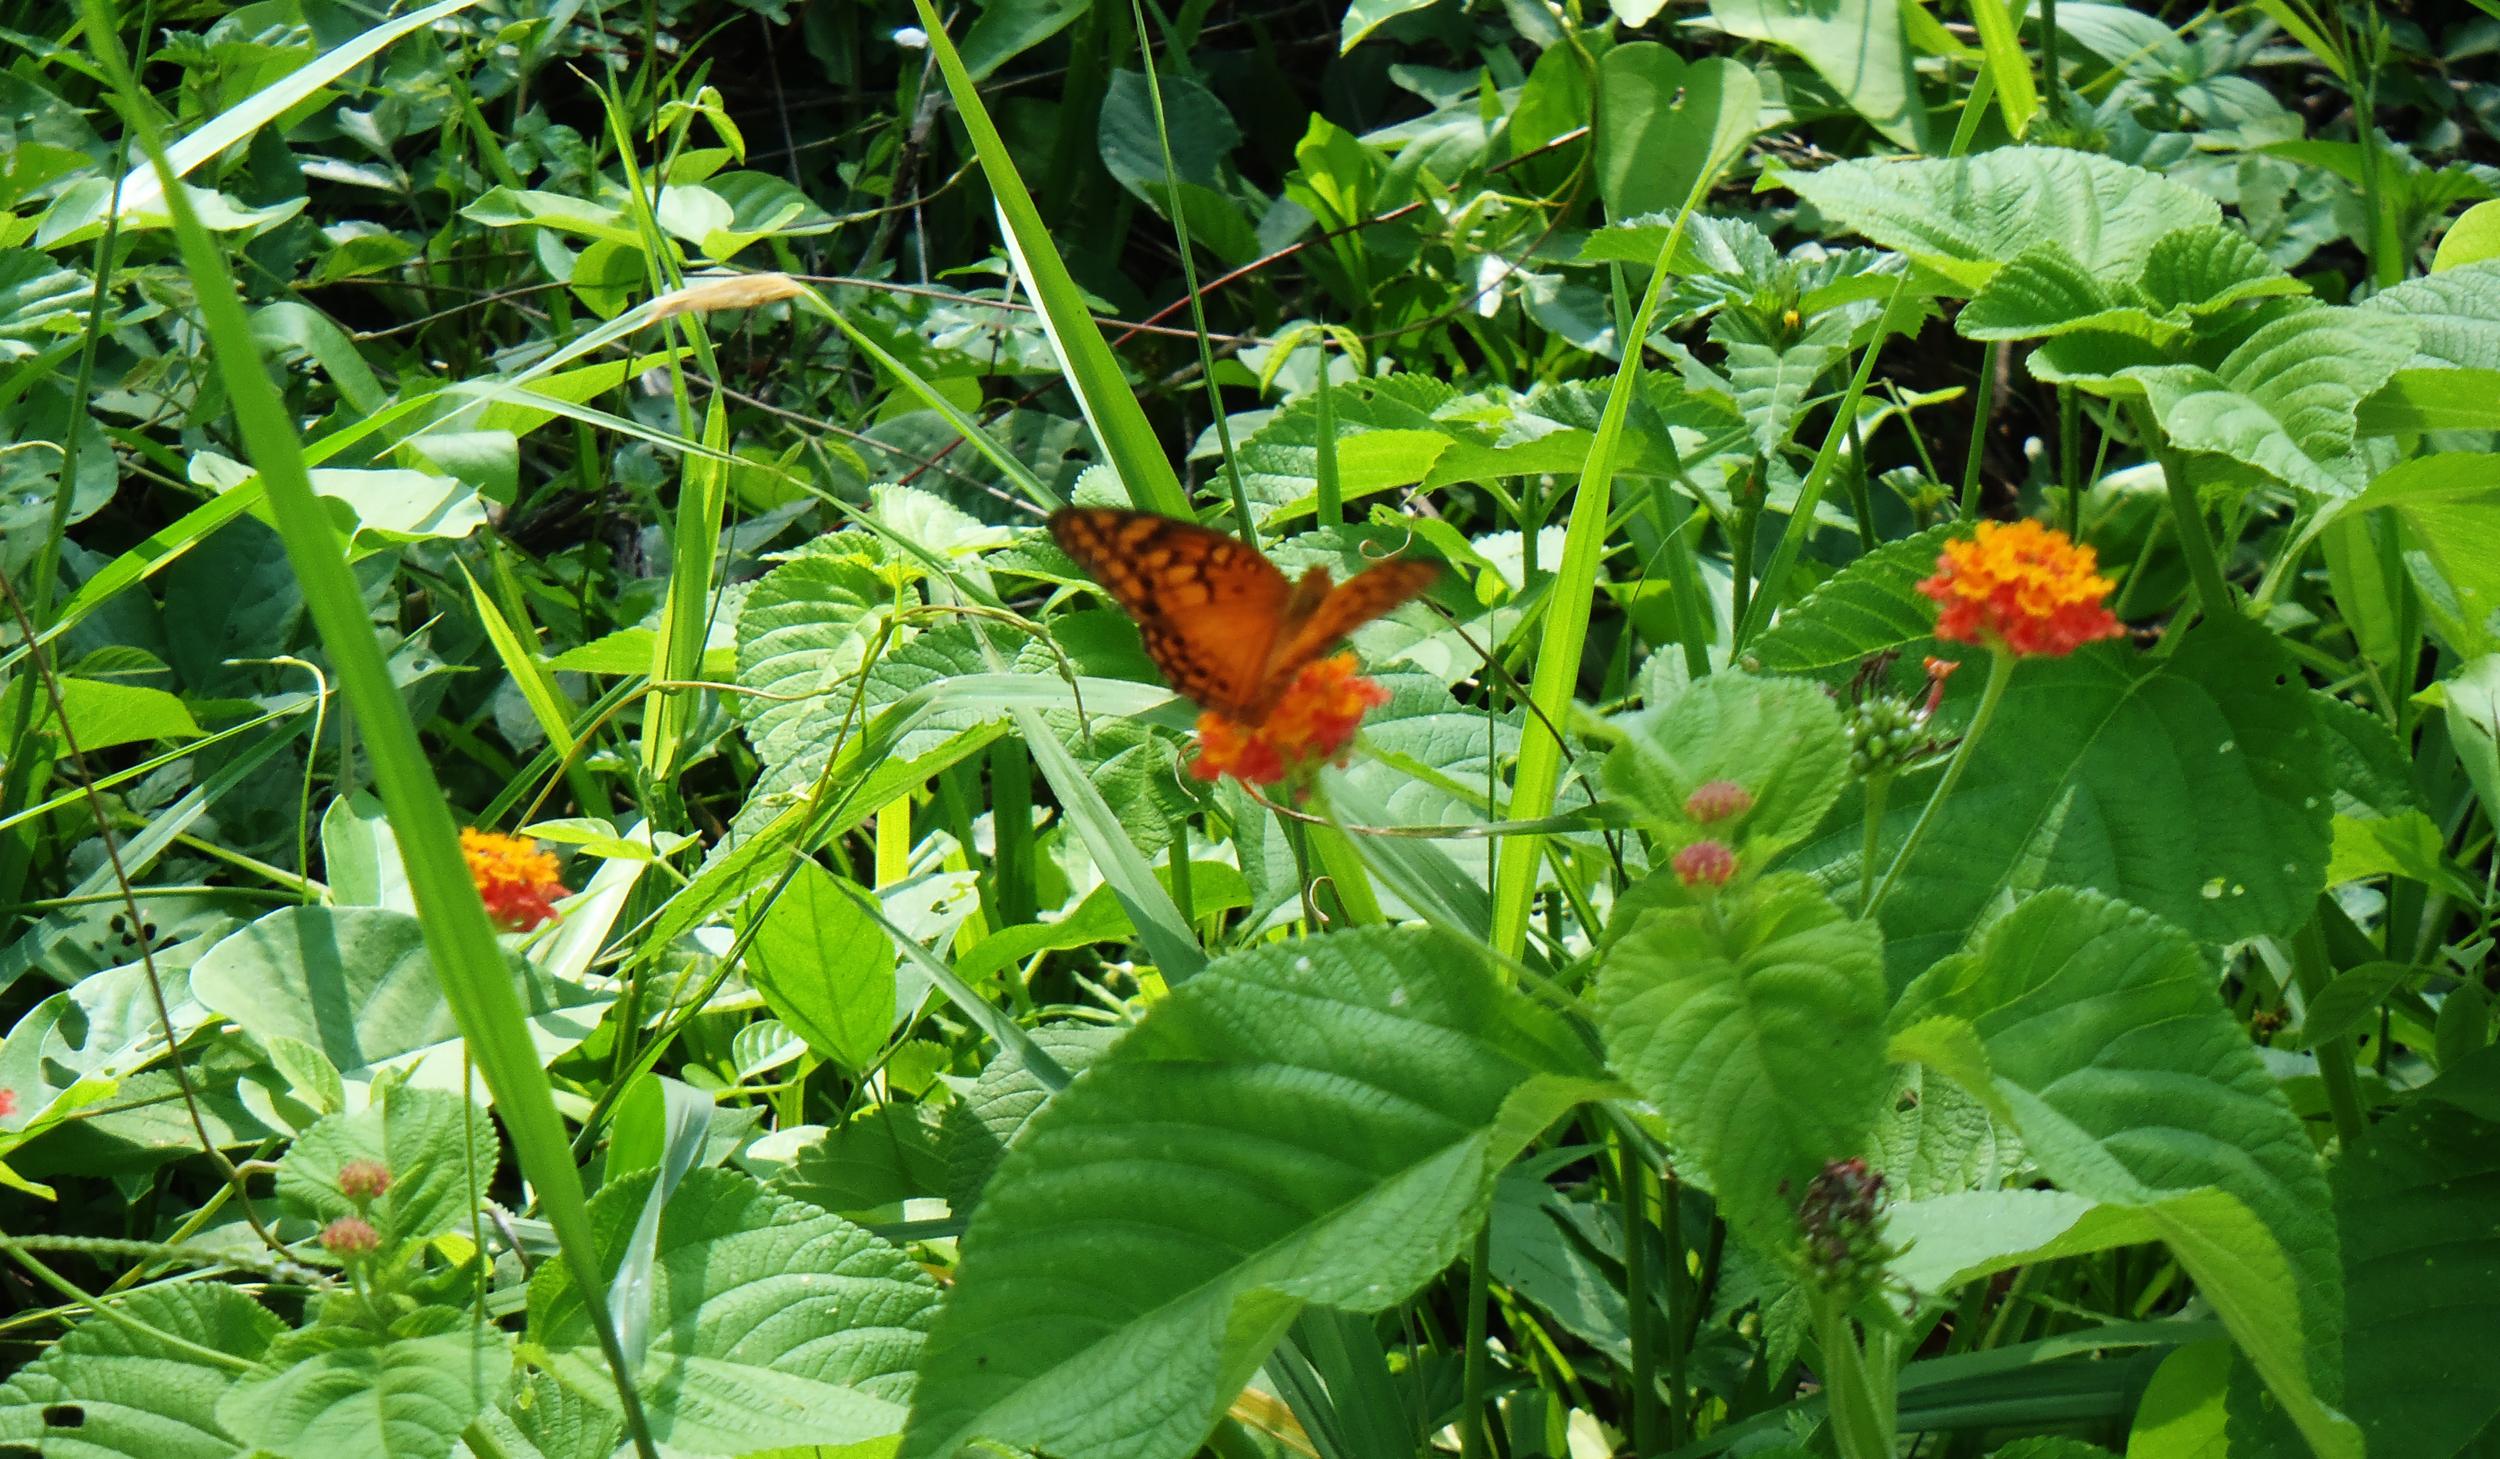 Selva tropical: tambe conoci como pulmon di mundo y pues na interes di nos tur pa proteha